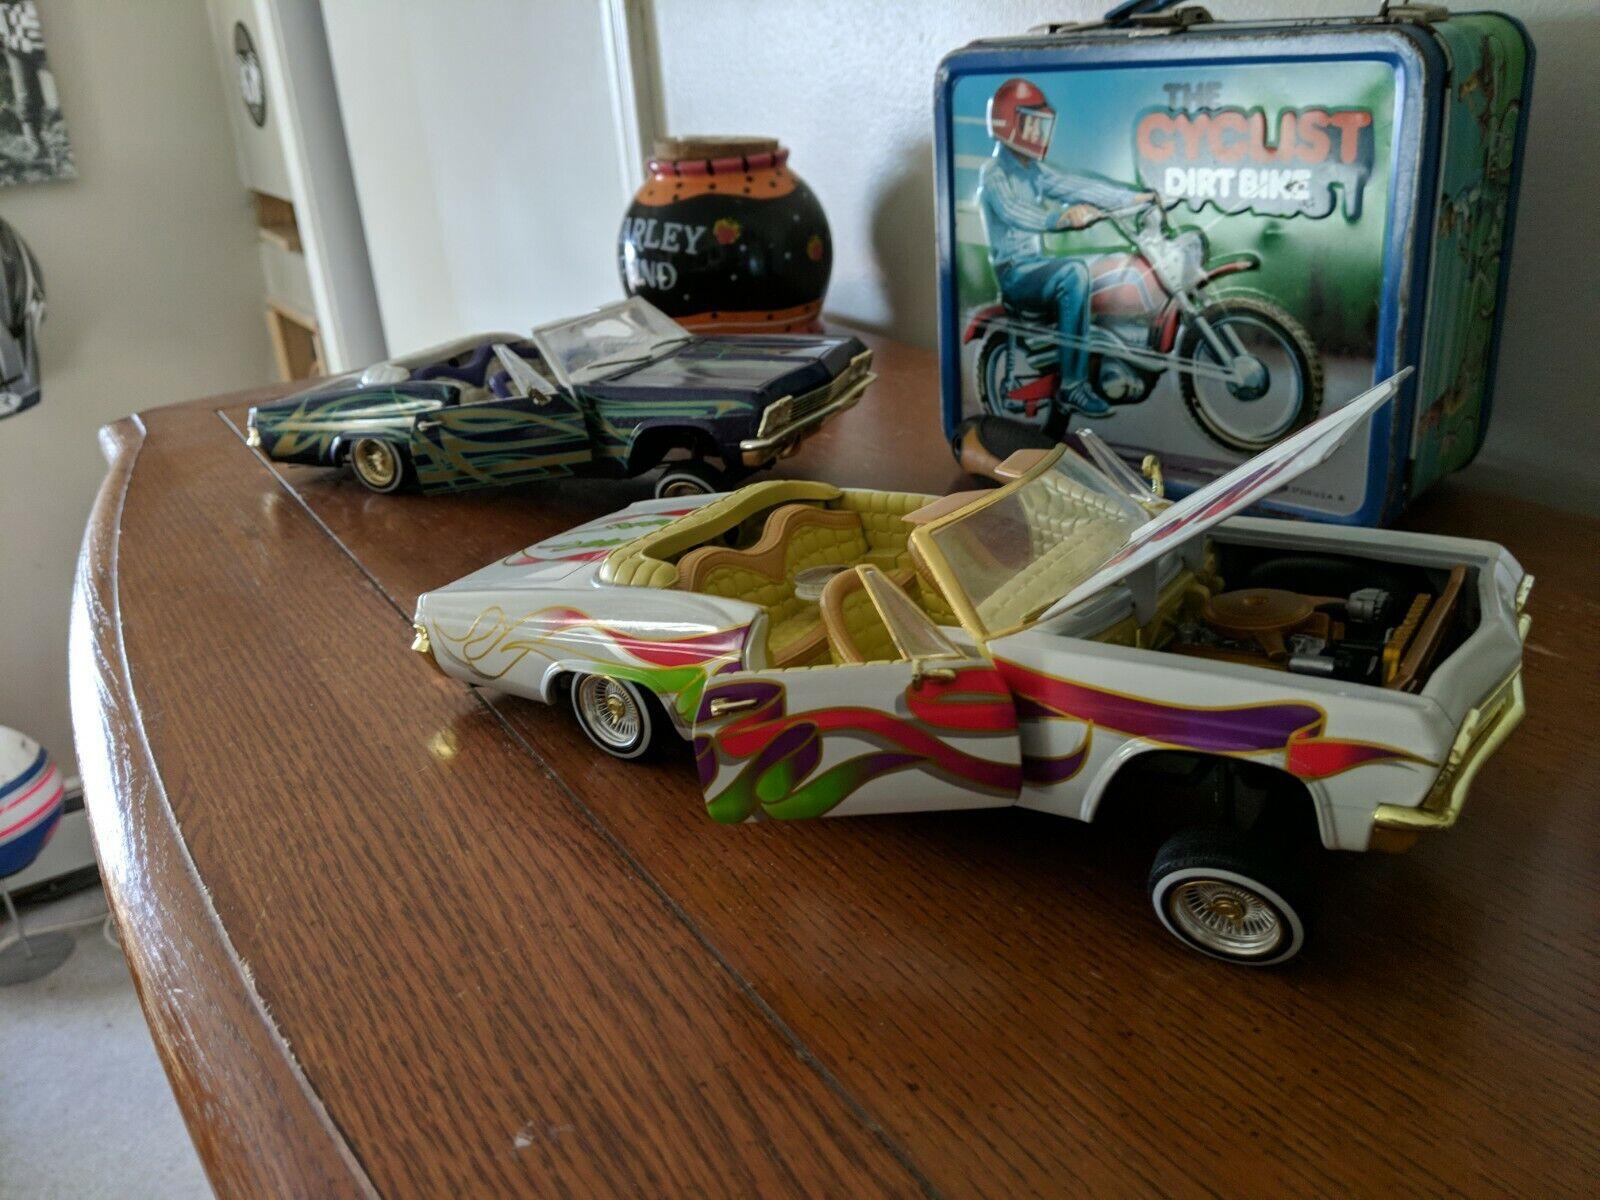 1 18 Hot Wheels 1965 Chevy Impala Lowrider Magazine coche